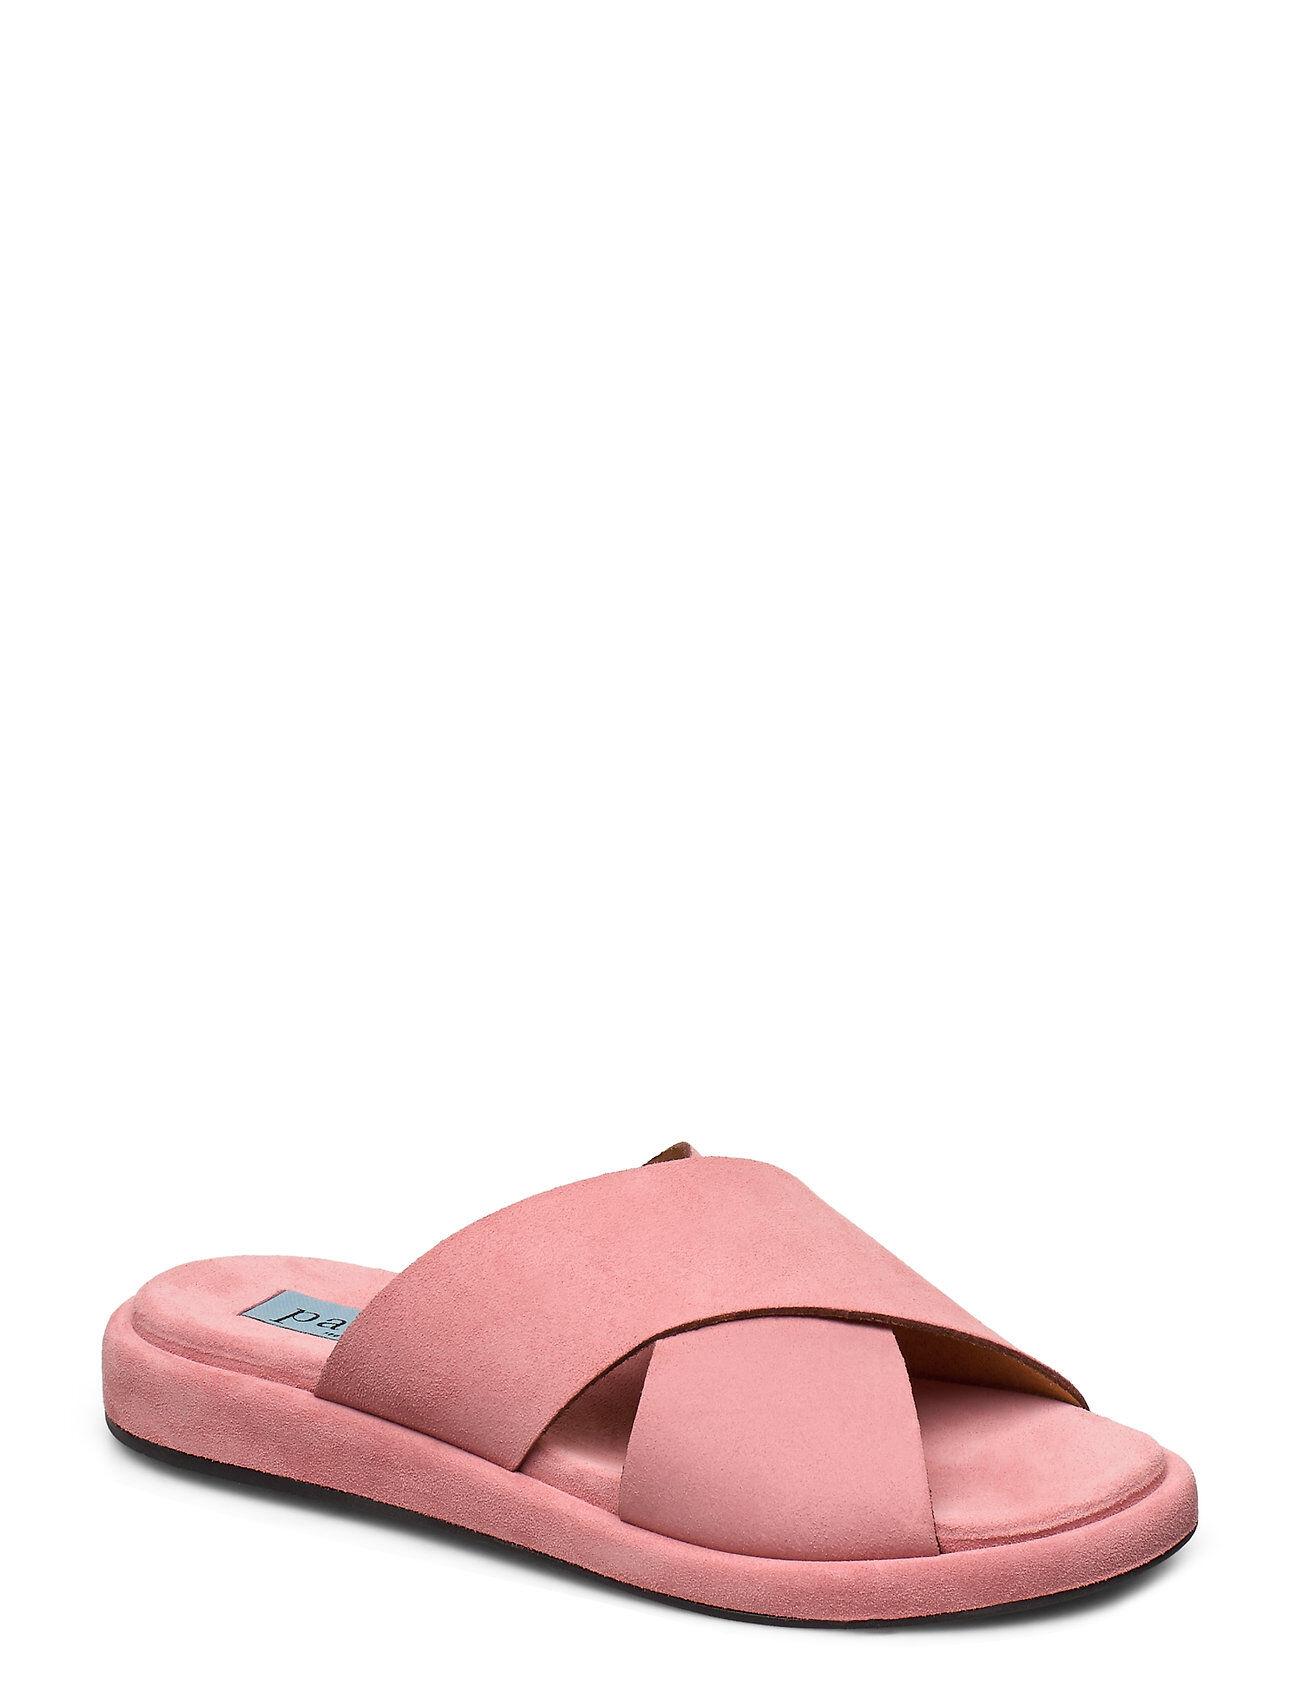 Apair Plateau Cross Simple Shoes Summer Shoes Flat Sandals Vaaleanpunainen Apair